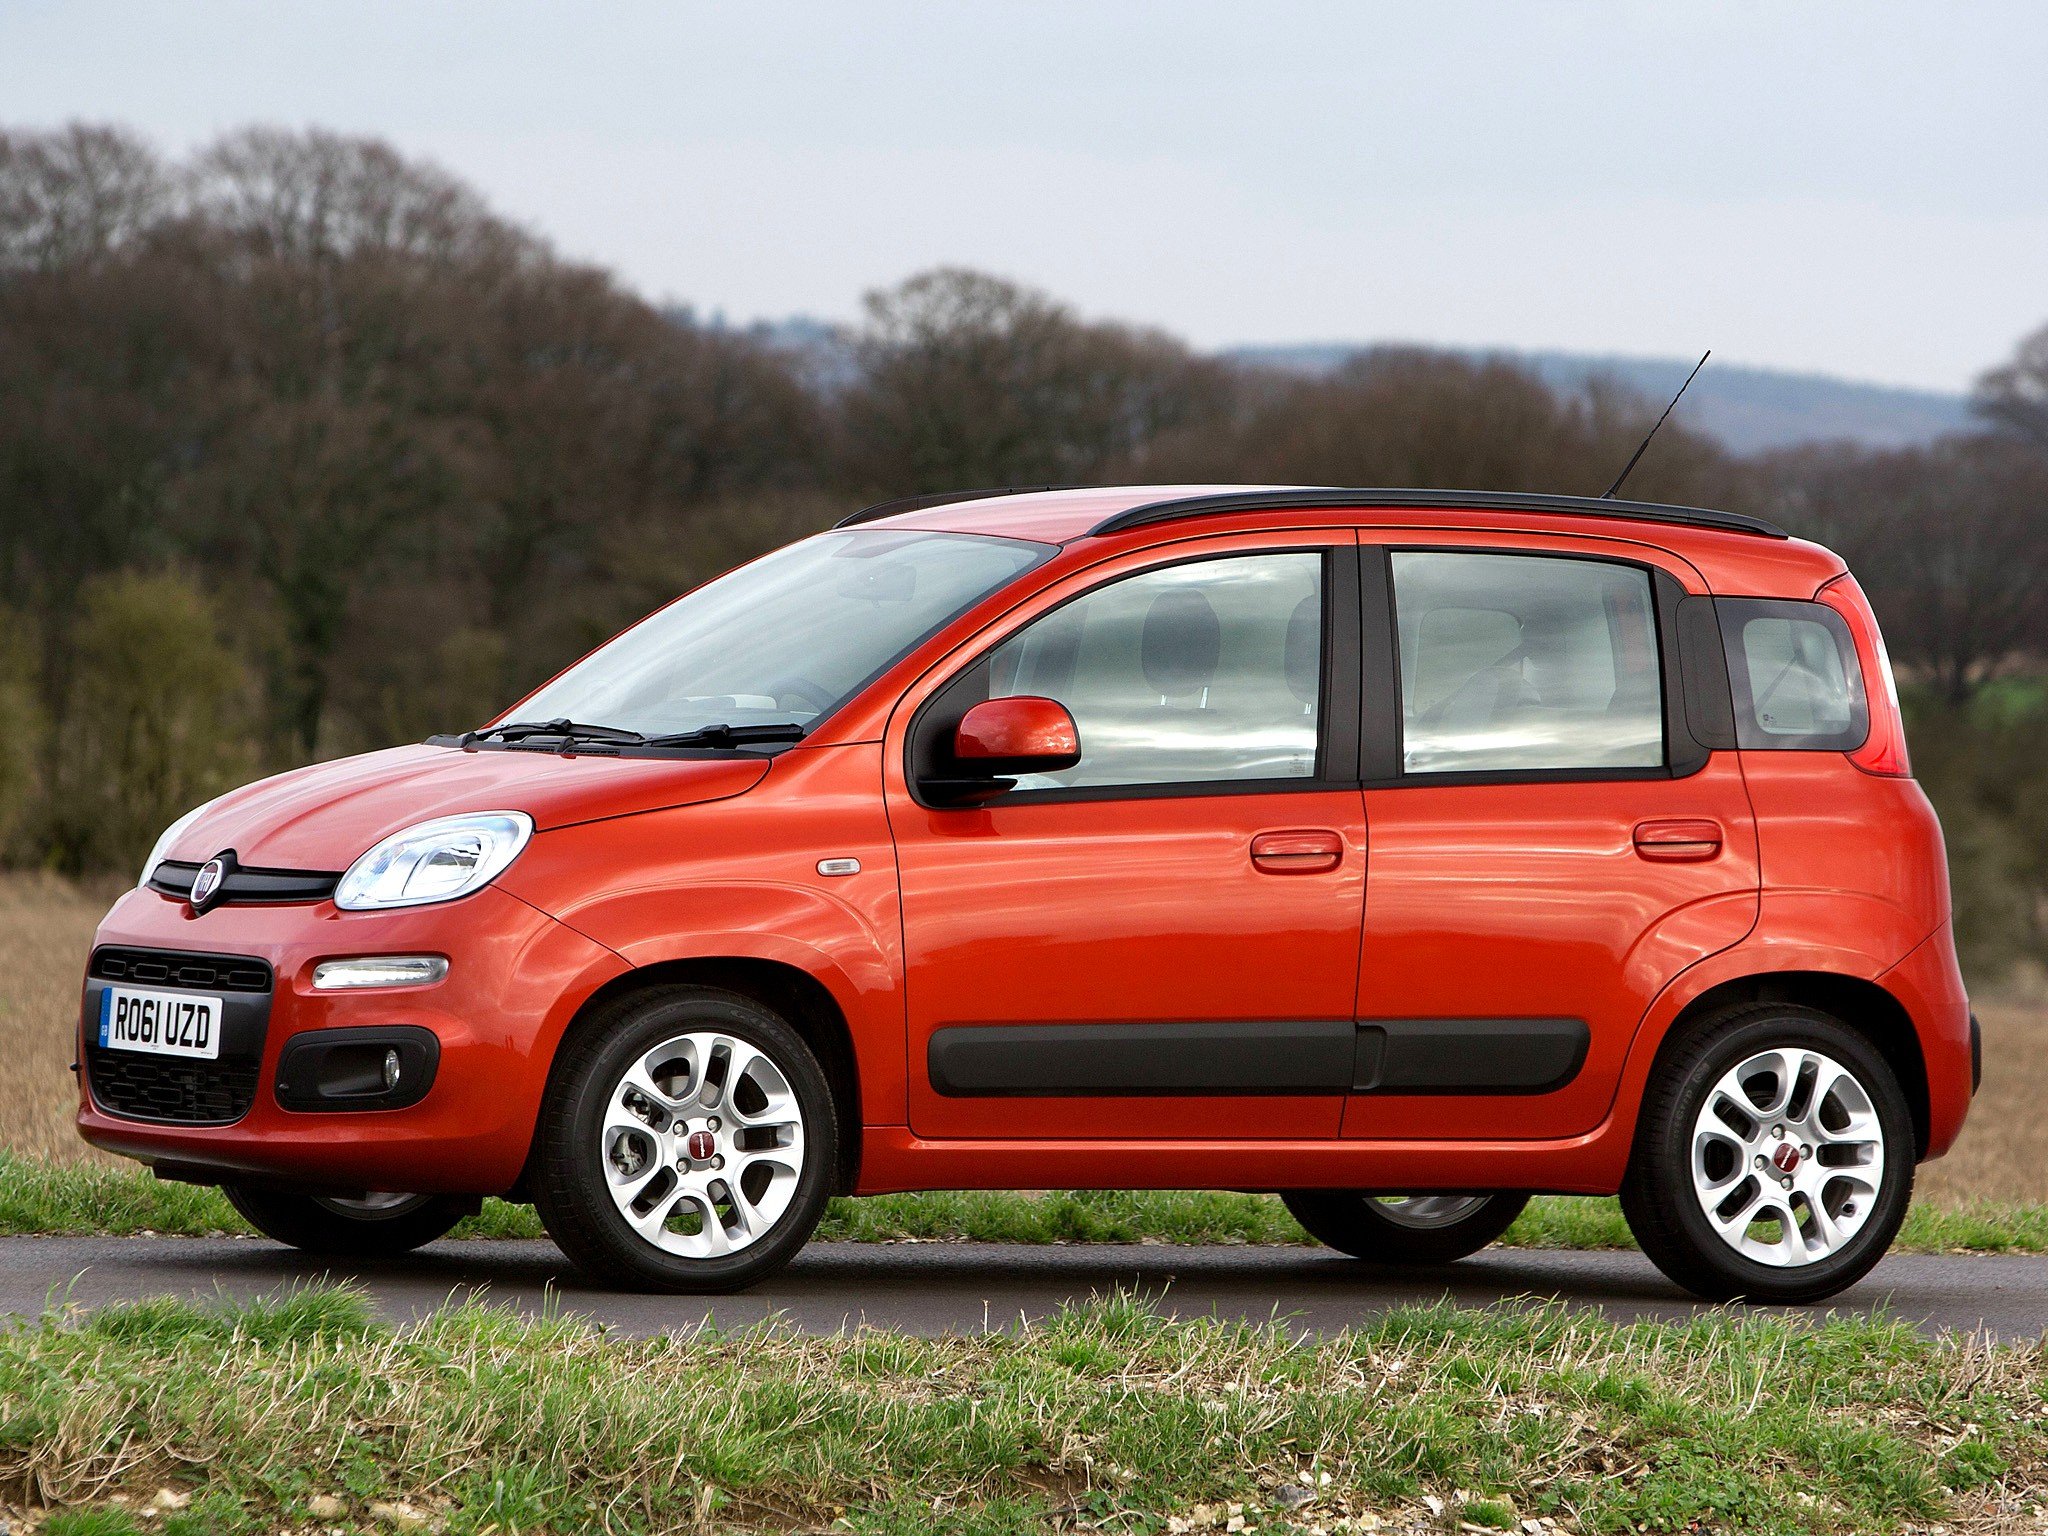 Fiat Panda Specs 2011 2012 2013 2014 2015 2016